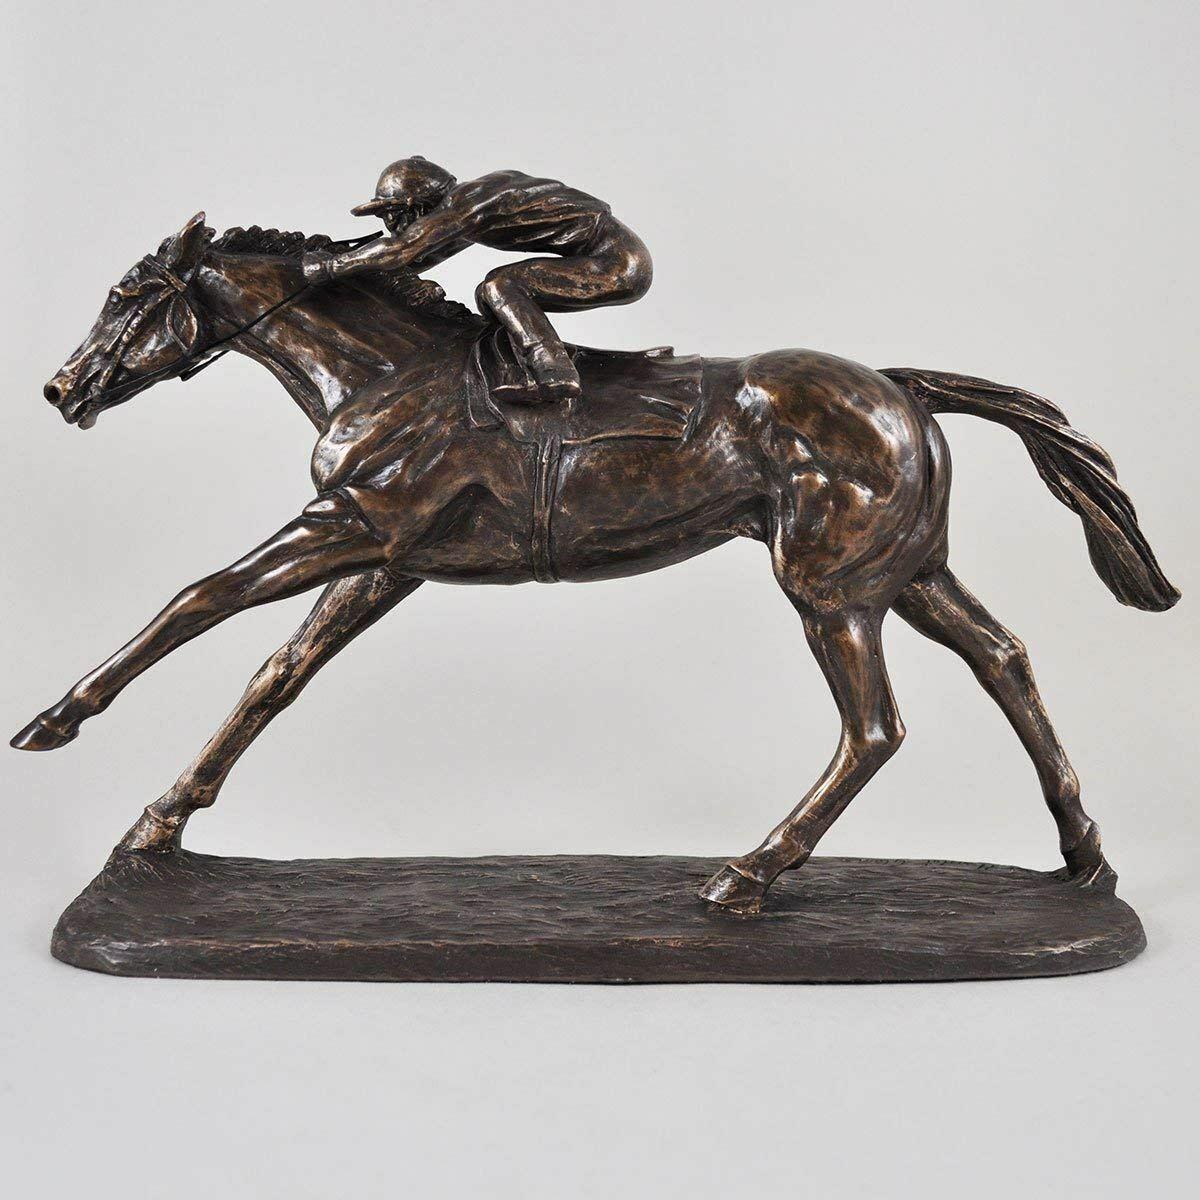 Flat Race Horse and Jockey Statue Sculpture Ideal Equestrian Gift